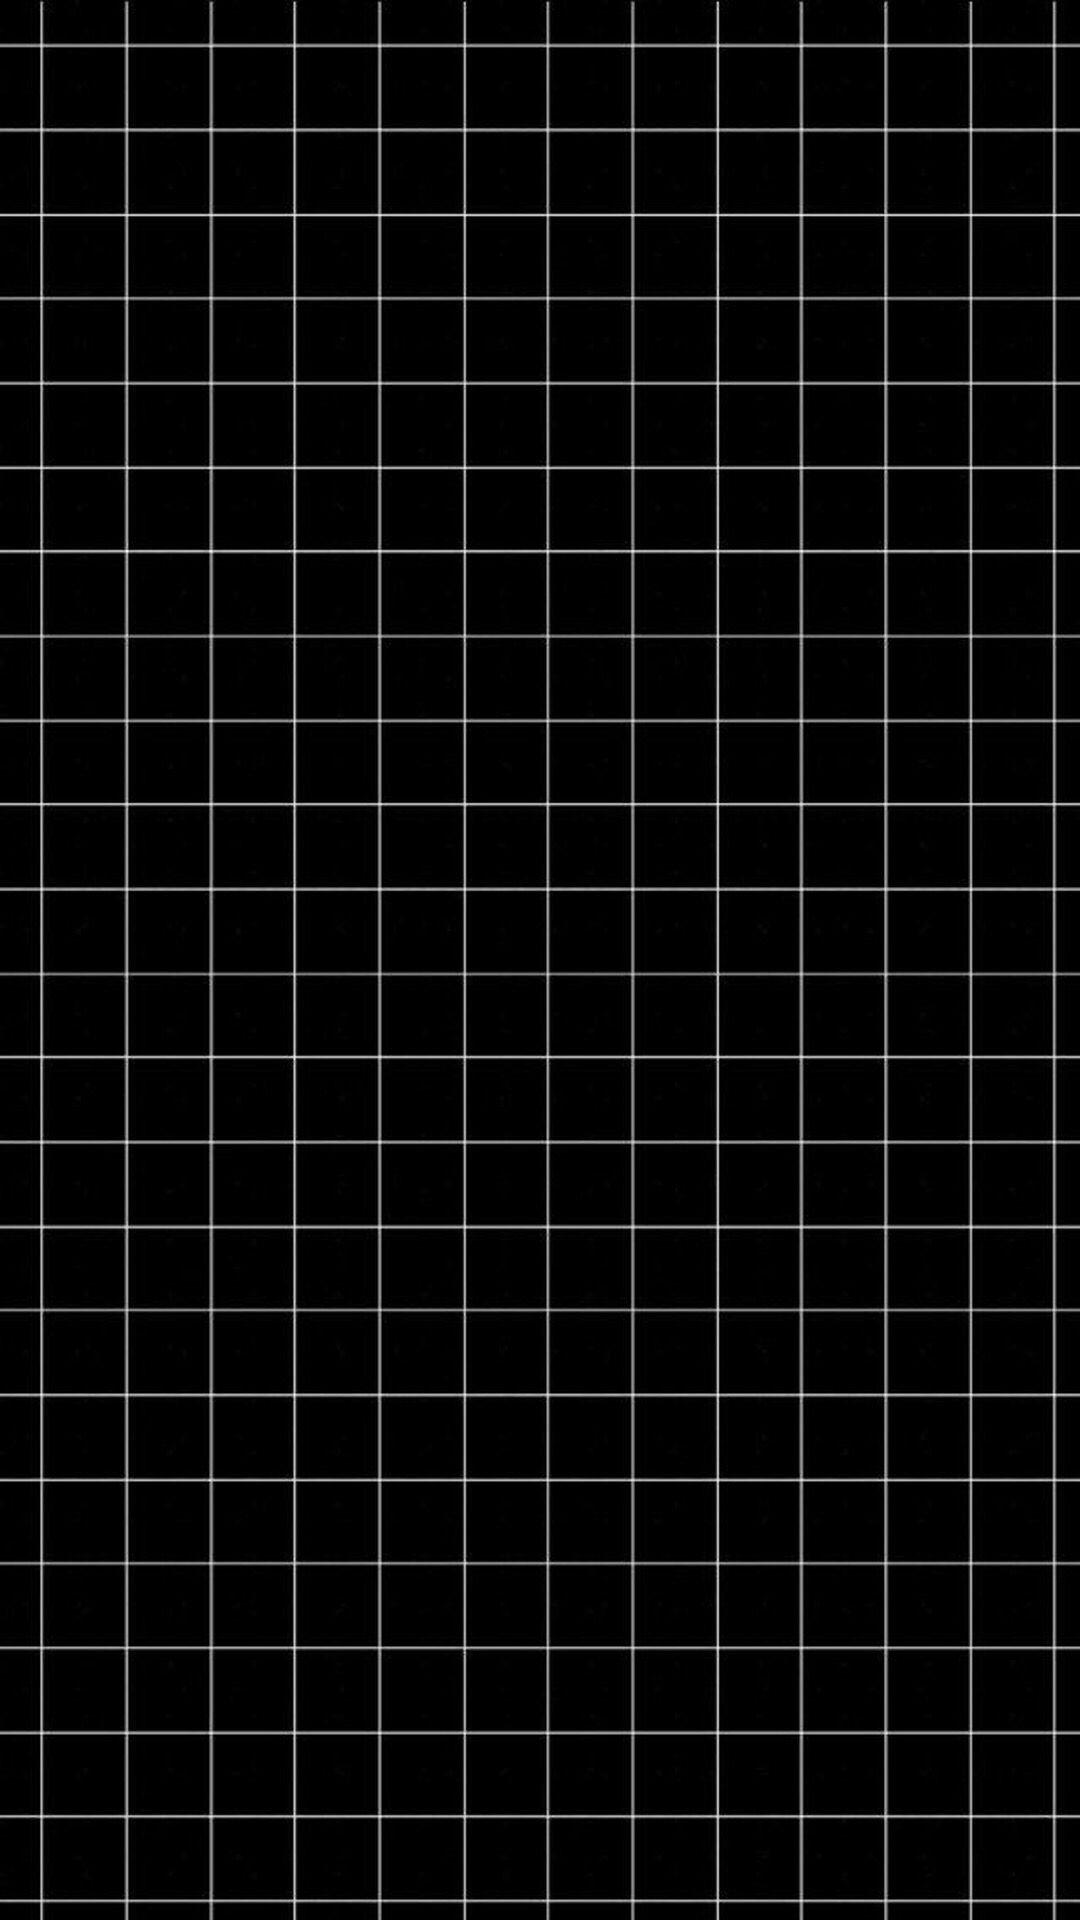 Pin By Samara Varela On Pattern Print New Wallpaper Iphone Iphone Wallpaper Grid Black Wallpaper Aesthetic black grid wallpaper